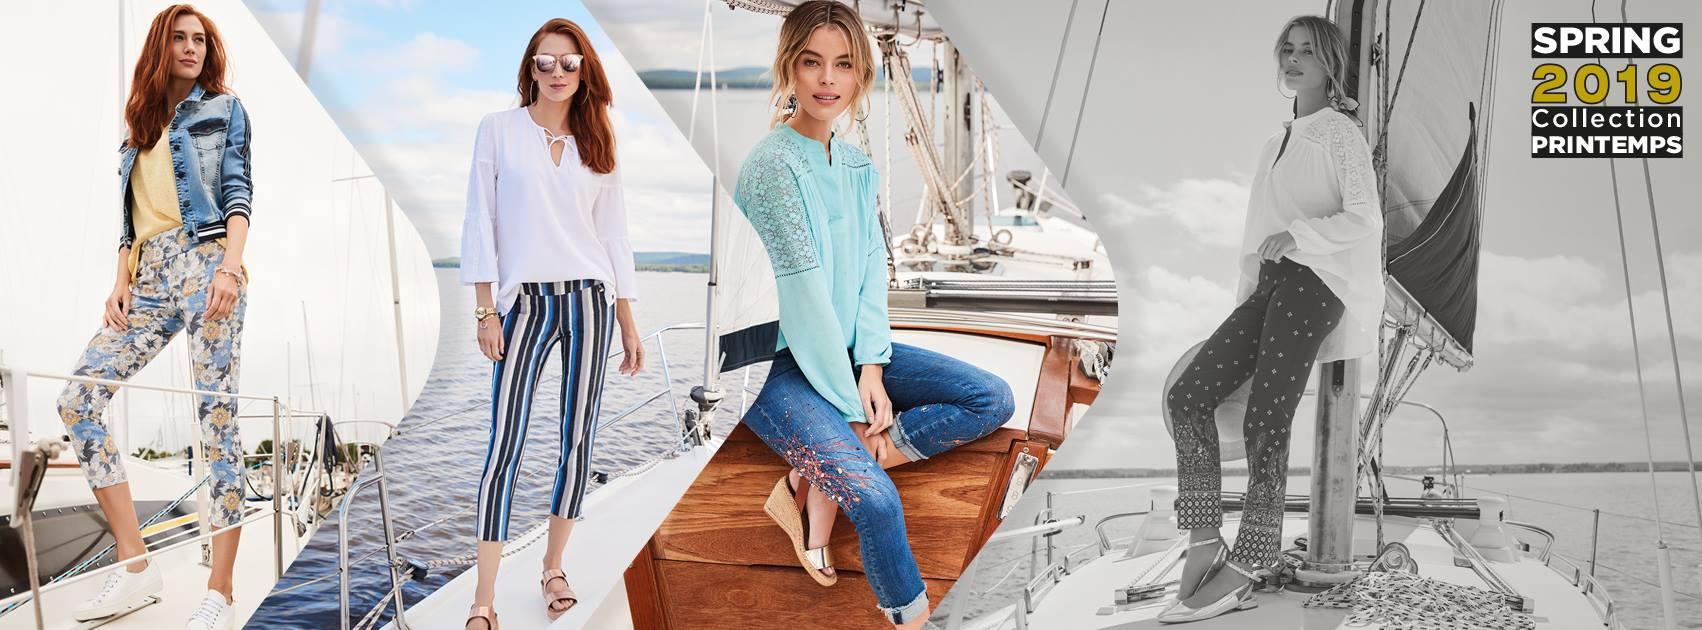 8 Spring Fashion Trends for Women - Erica Diamond